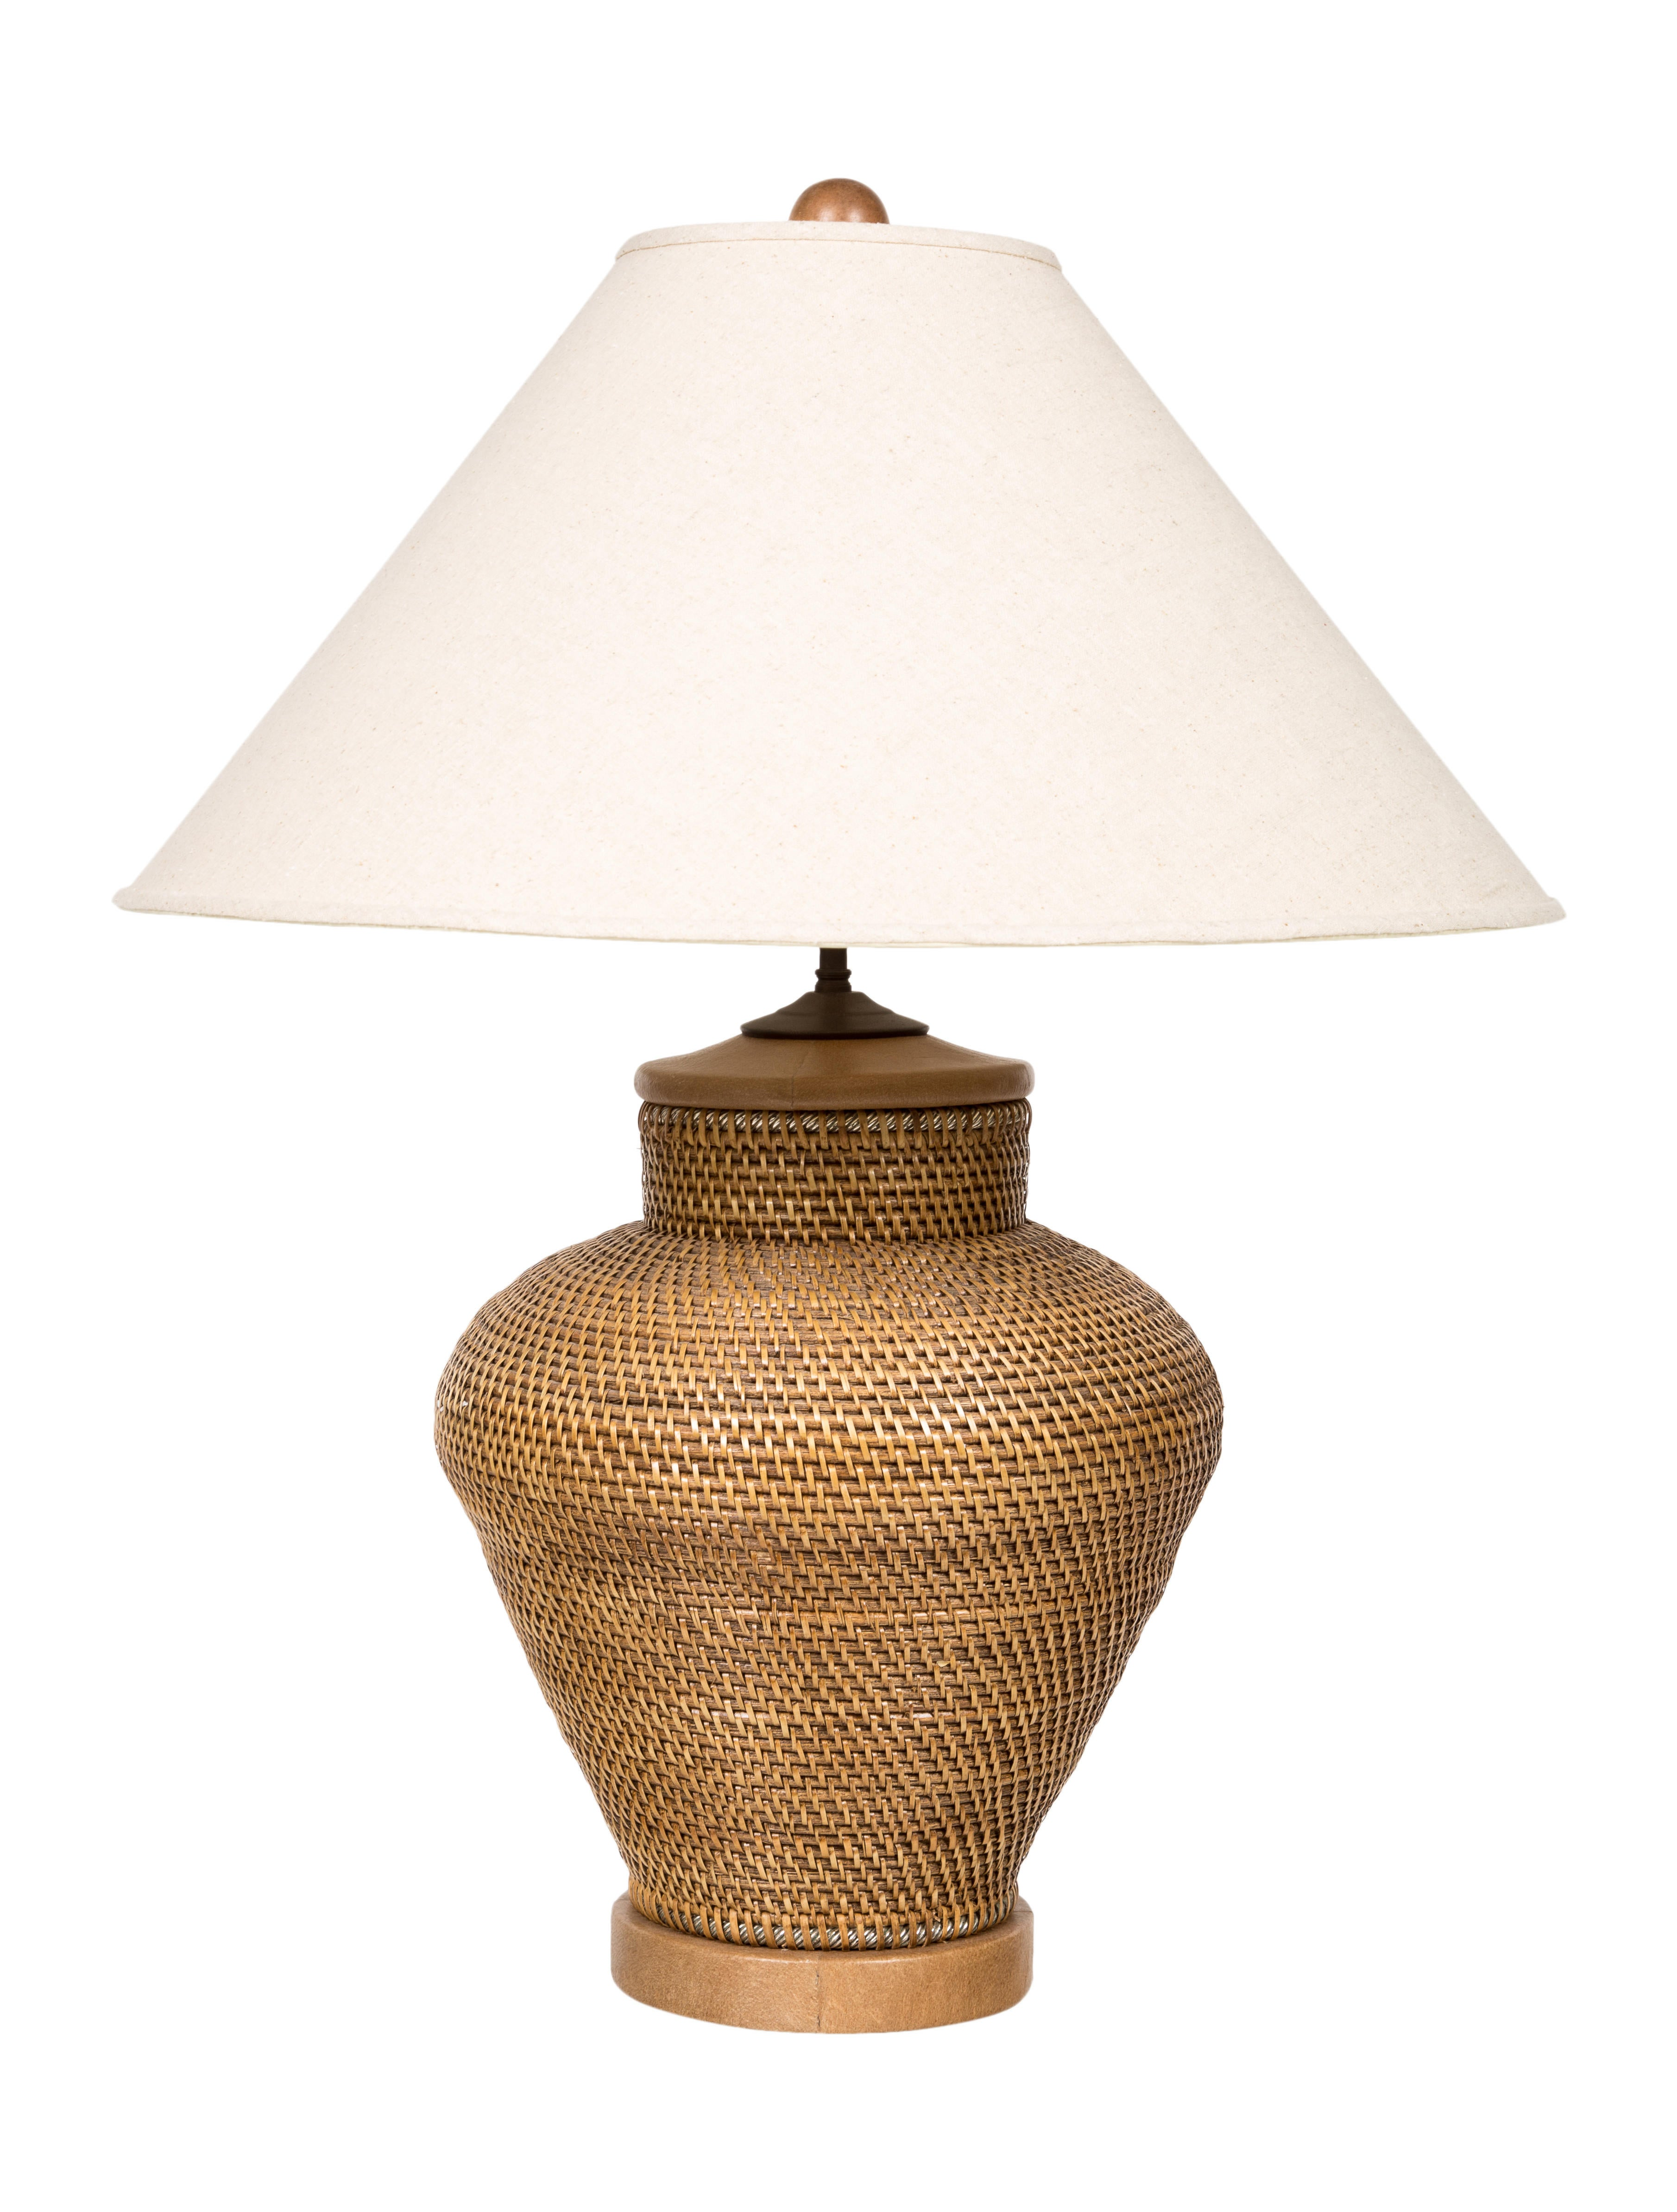 Rattan table lamp lighting lghti20376 the realreal rattan table lamp aloadofball Image collections